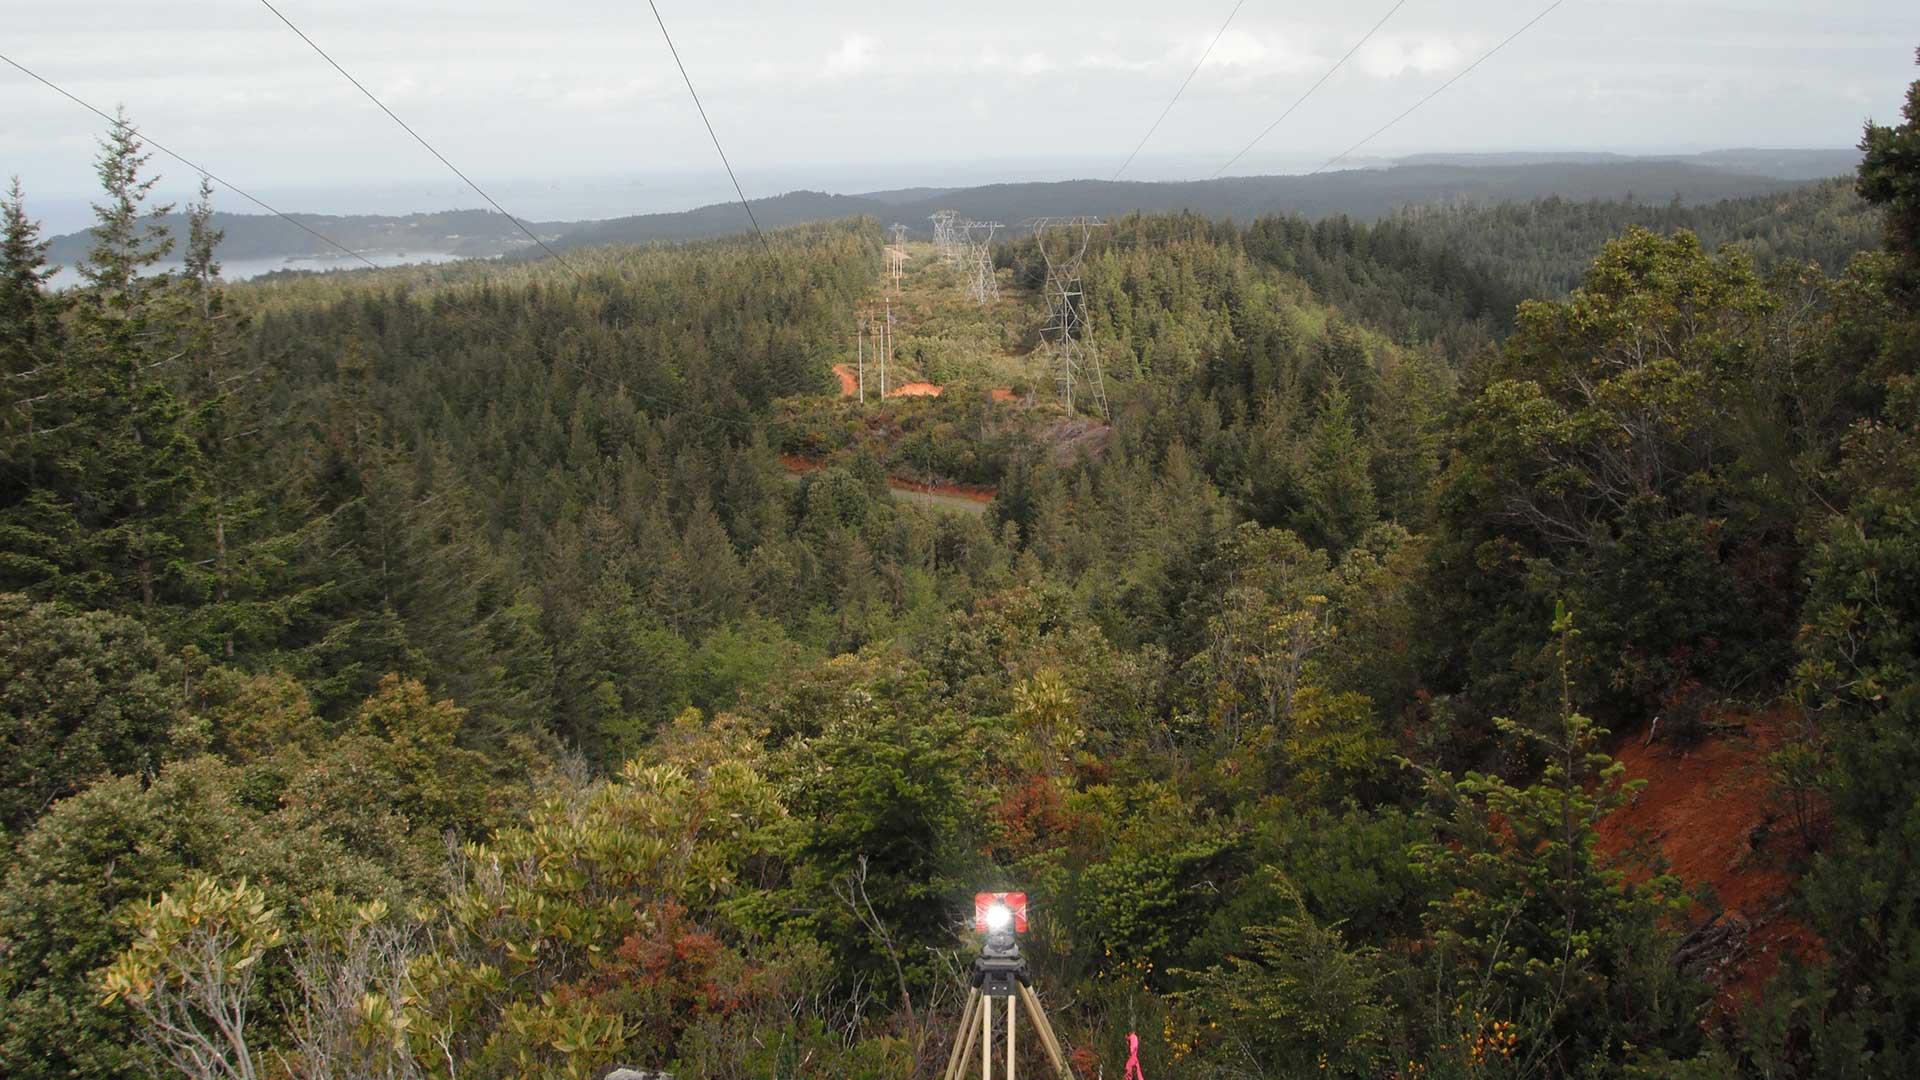 Bandon-Rogue No. 1 Transmission Line - survey